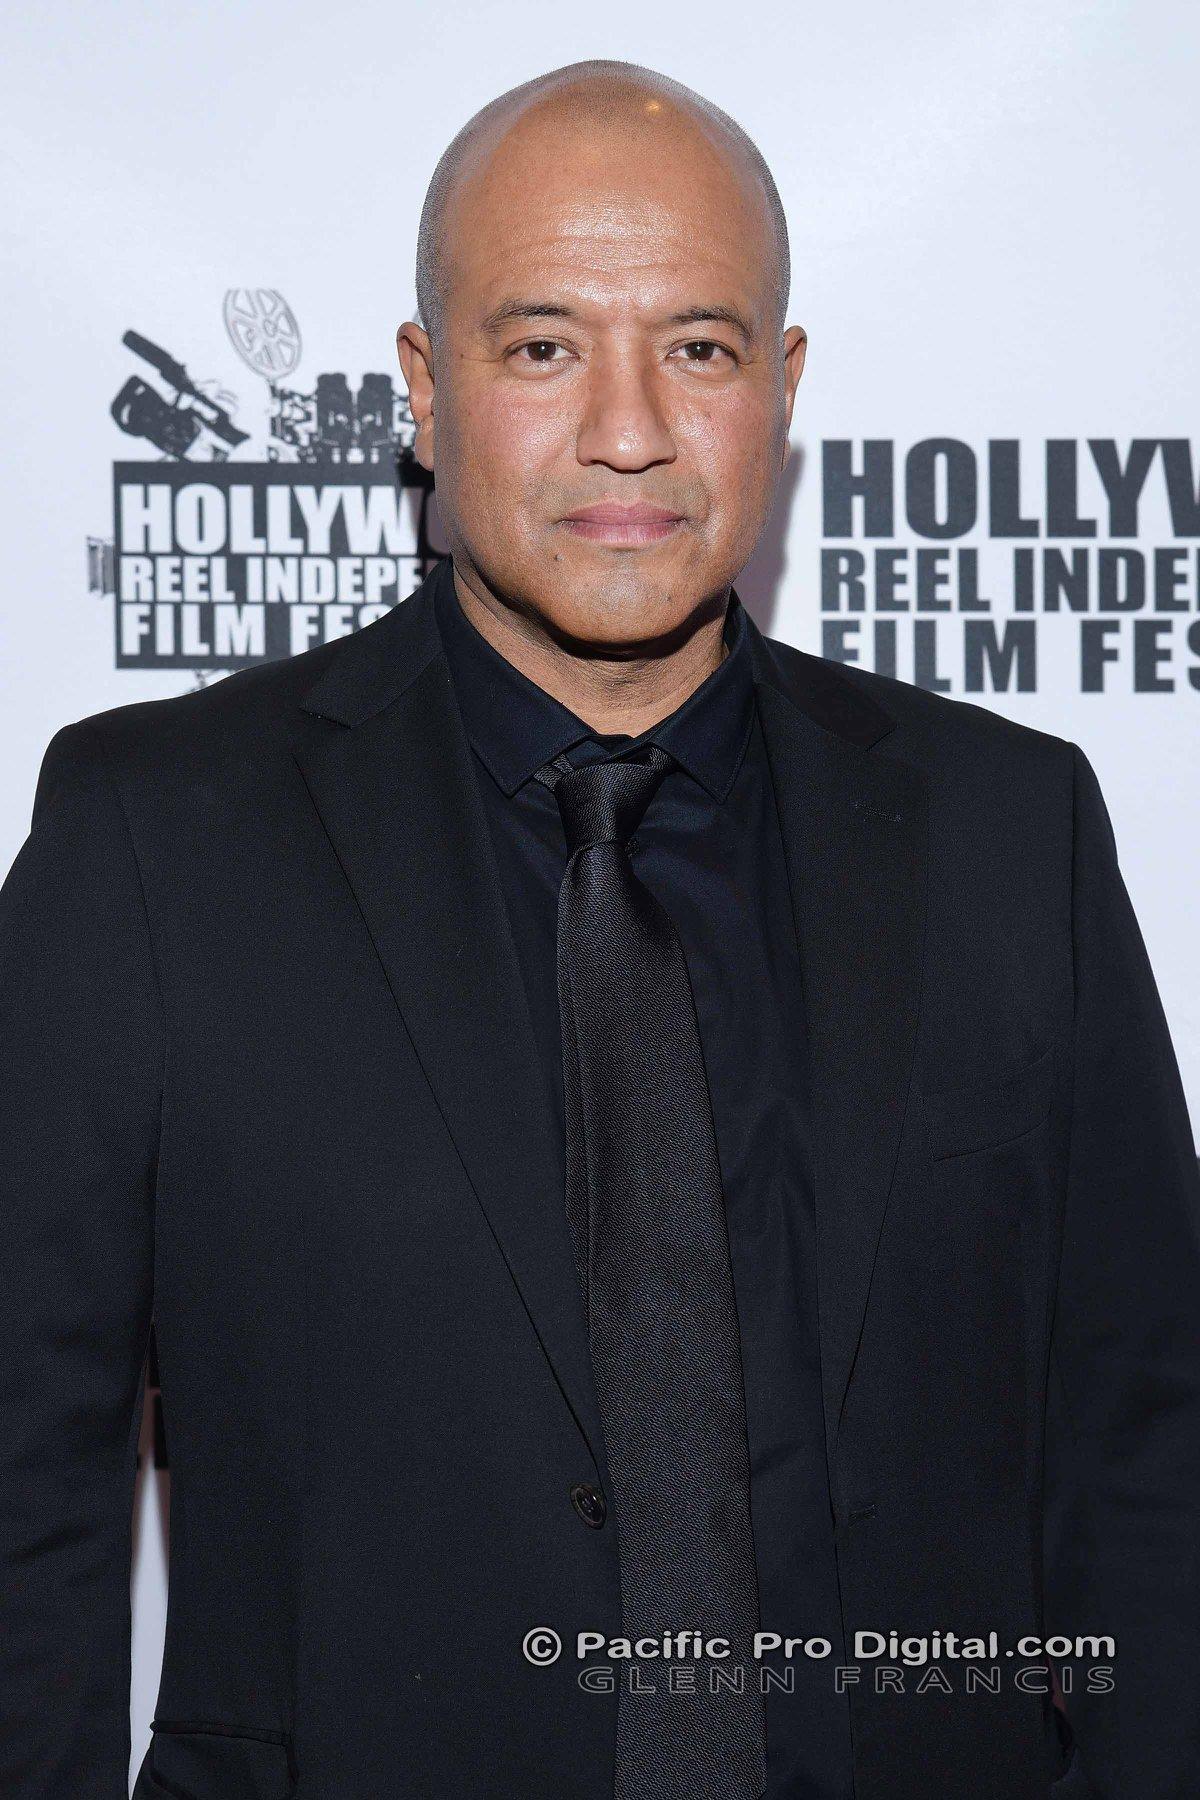 Hollywood Film Festival.jpg